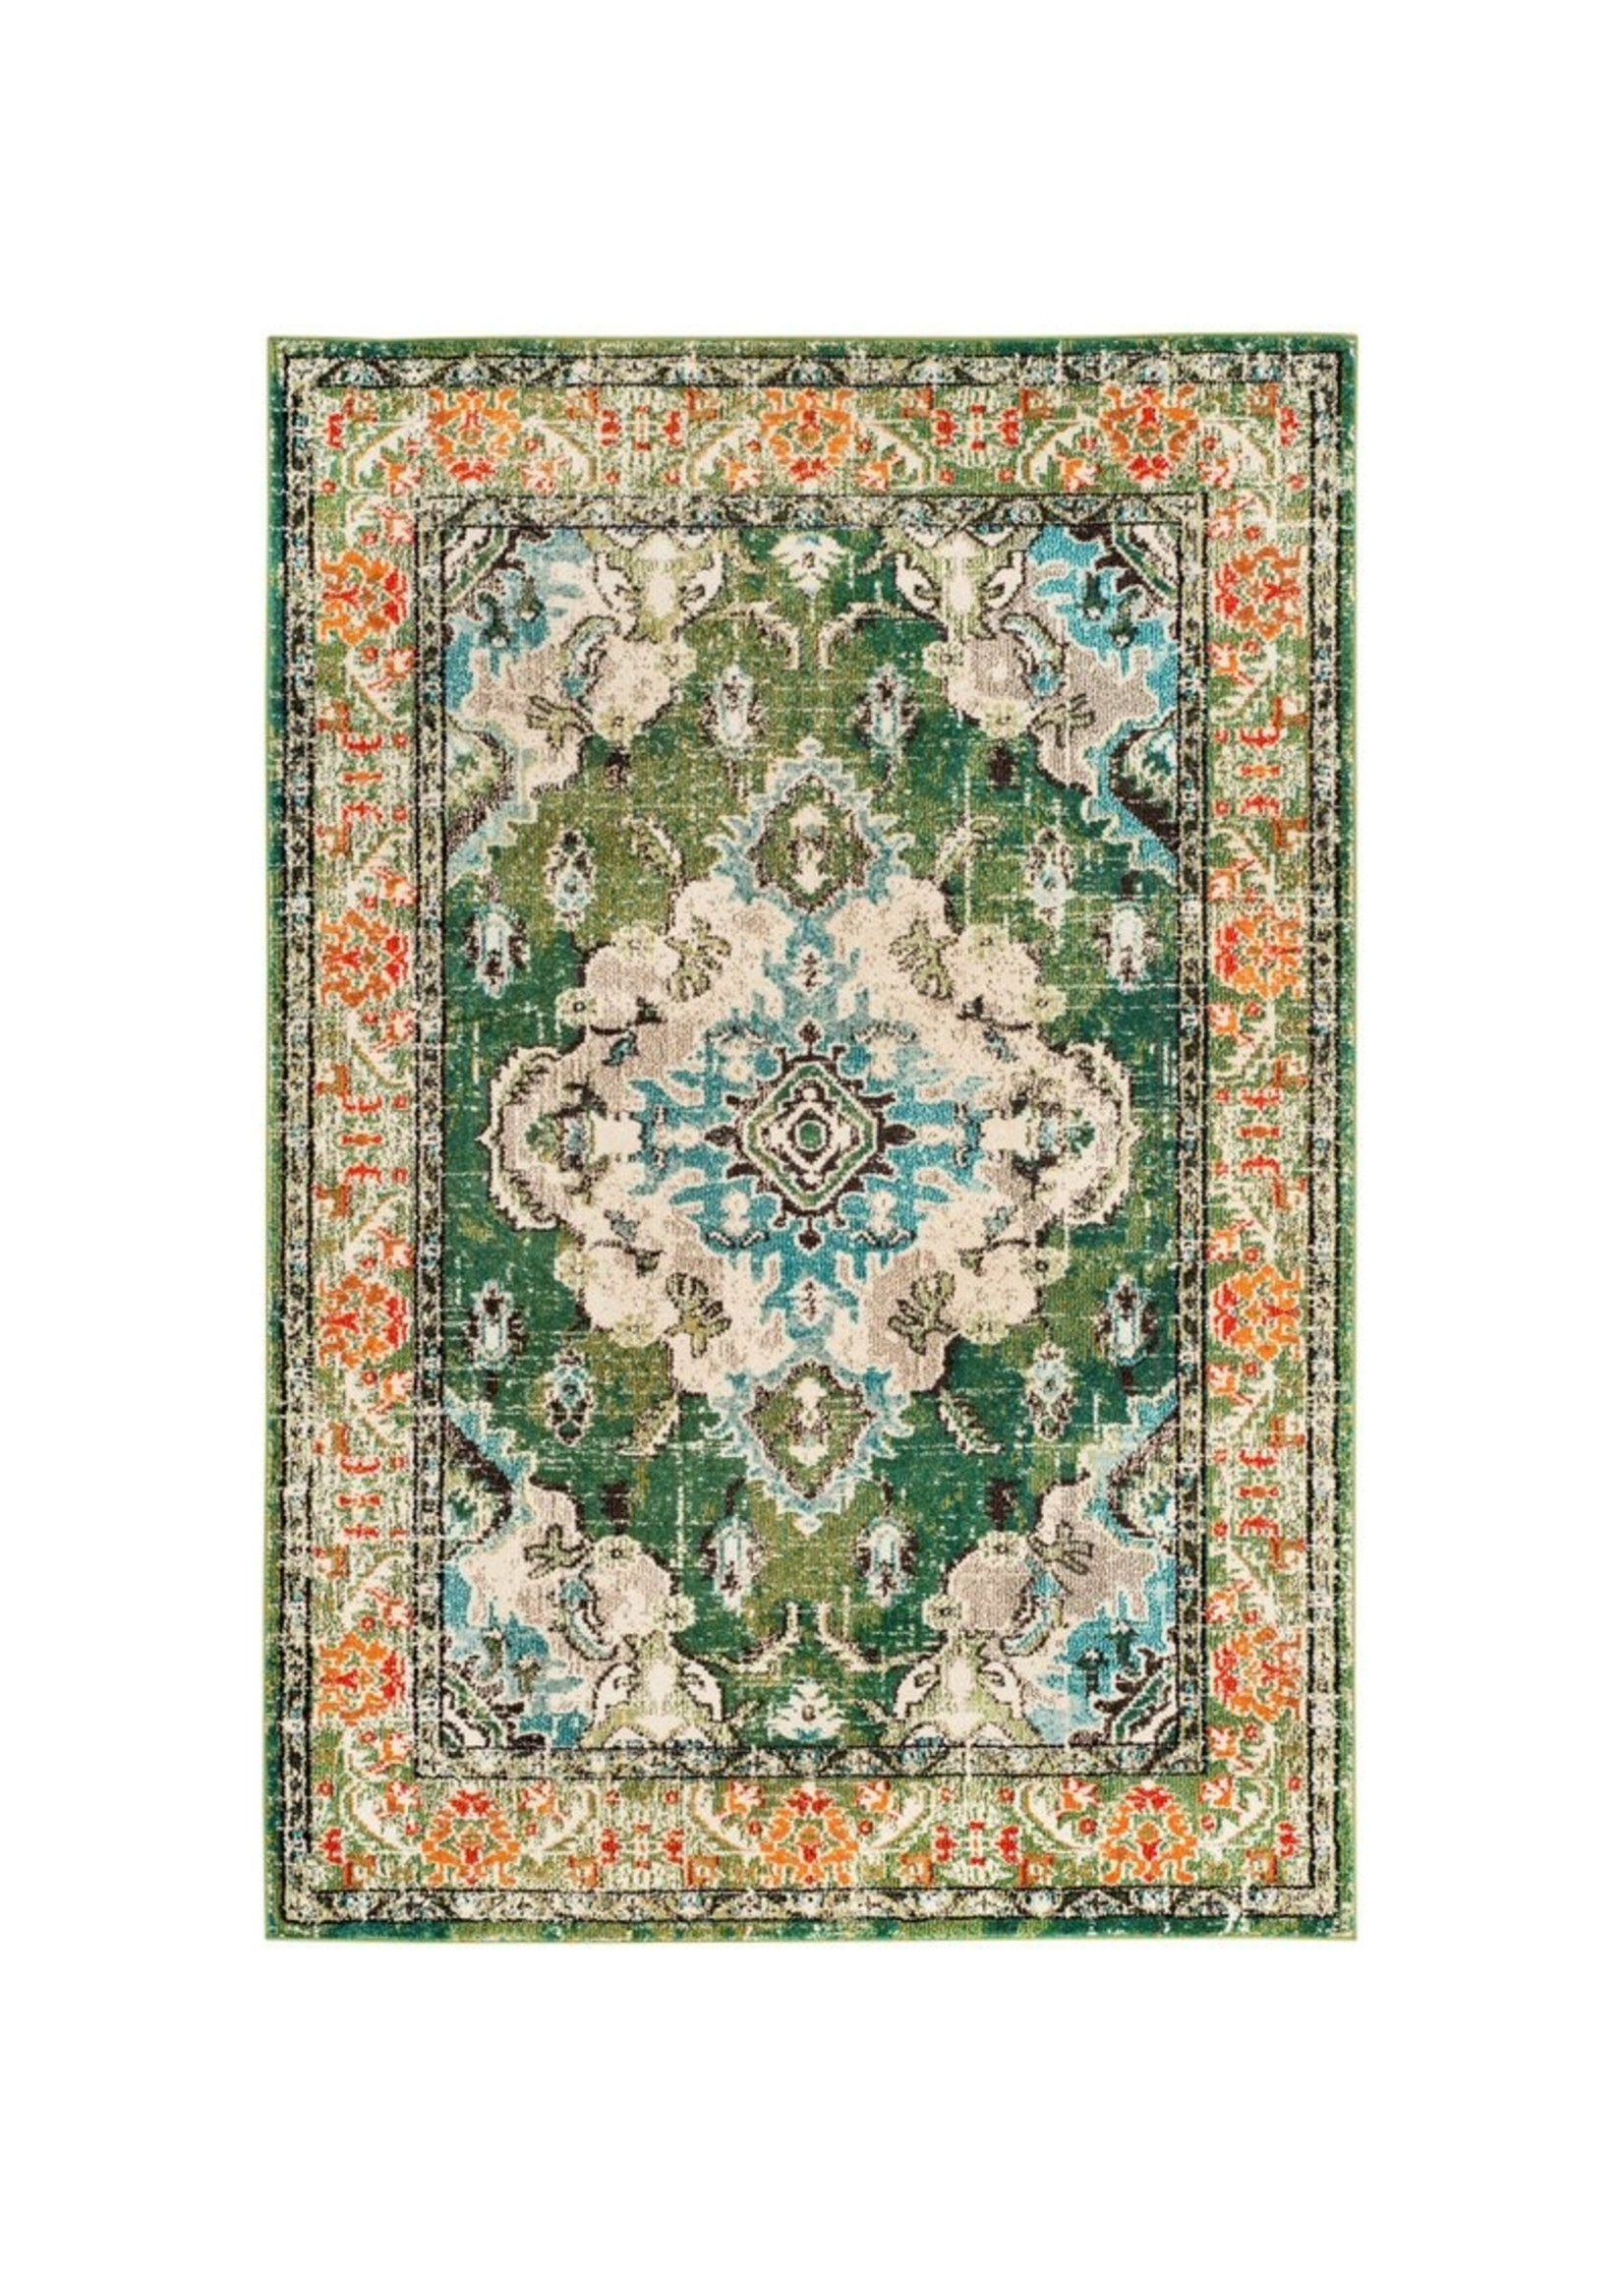 *10' x 14' -Indira Oriental Green/Light Blue Area Rug